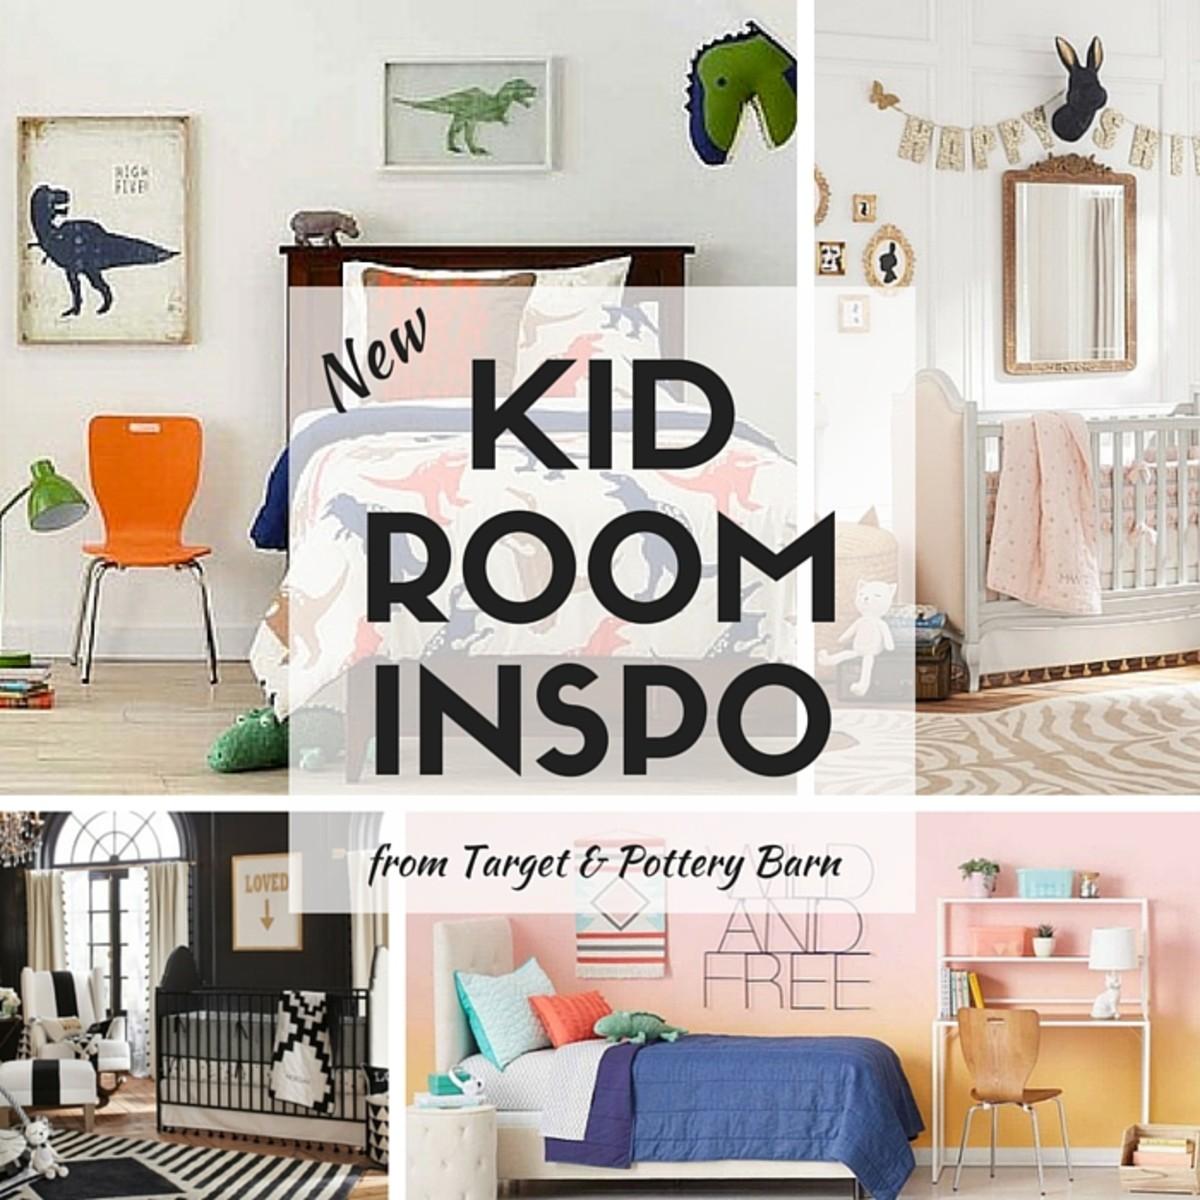 Kid Room Inspo 1